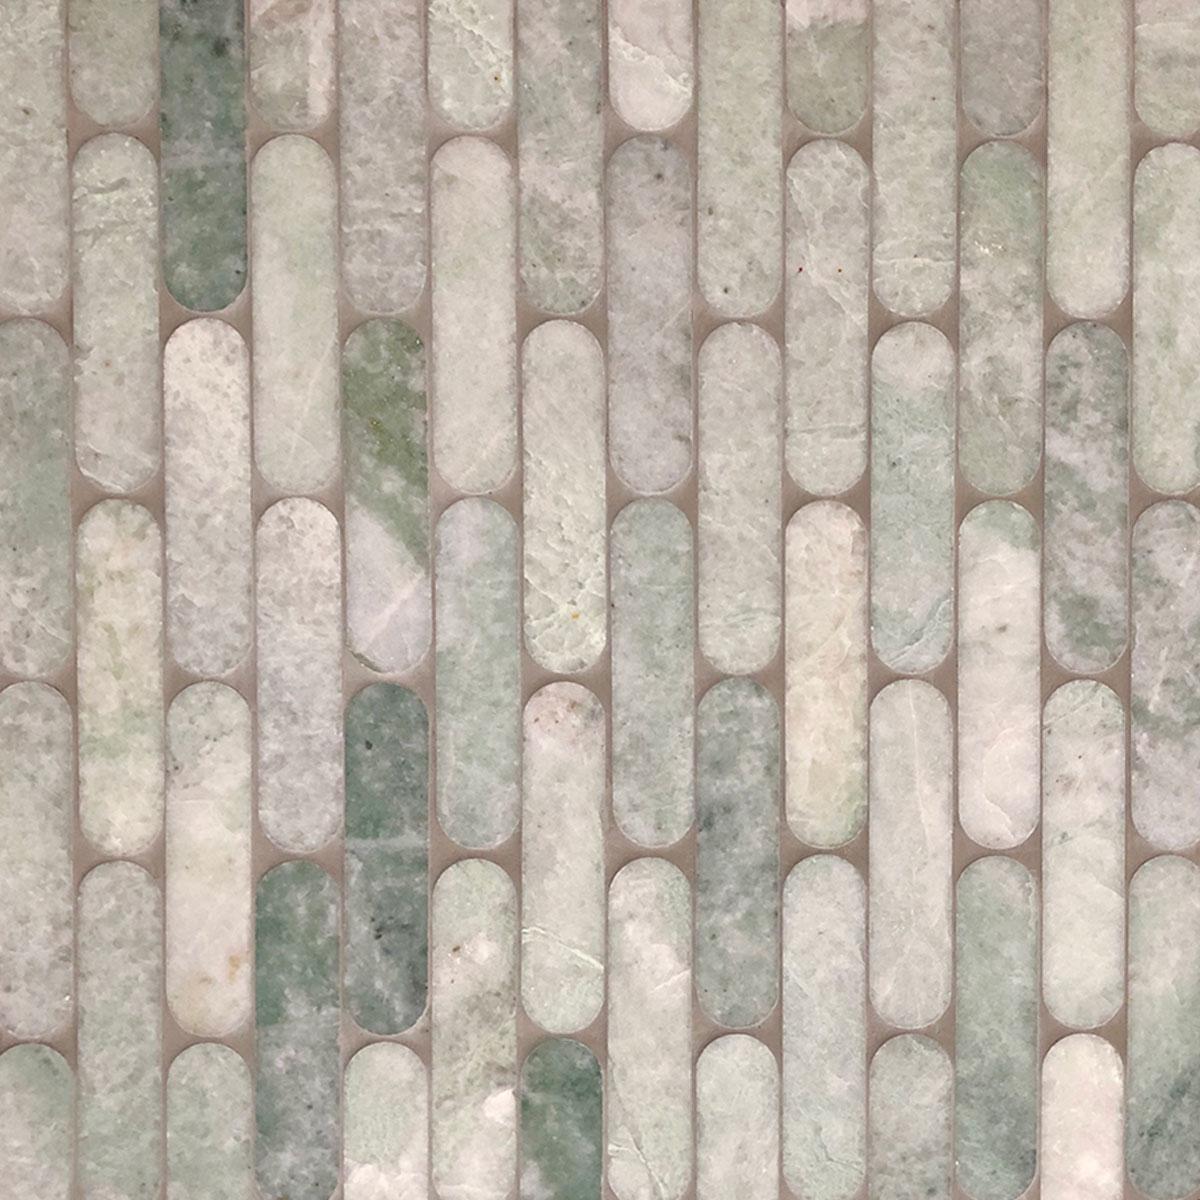 Tictax - Verdi Cristallo - Mosaic and Feature Tiles - Stone3 Brisbane